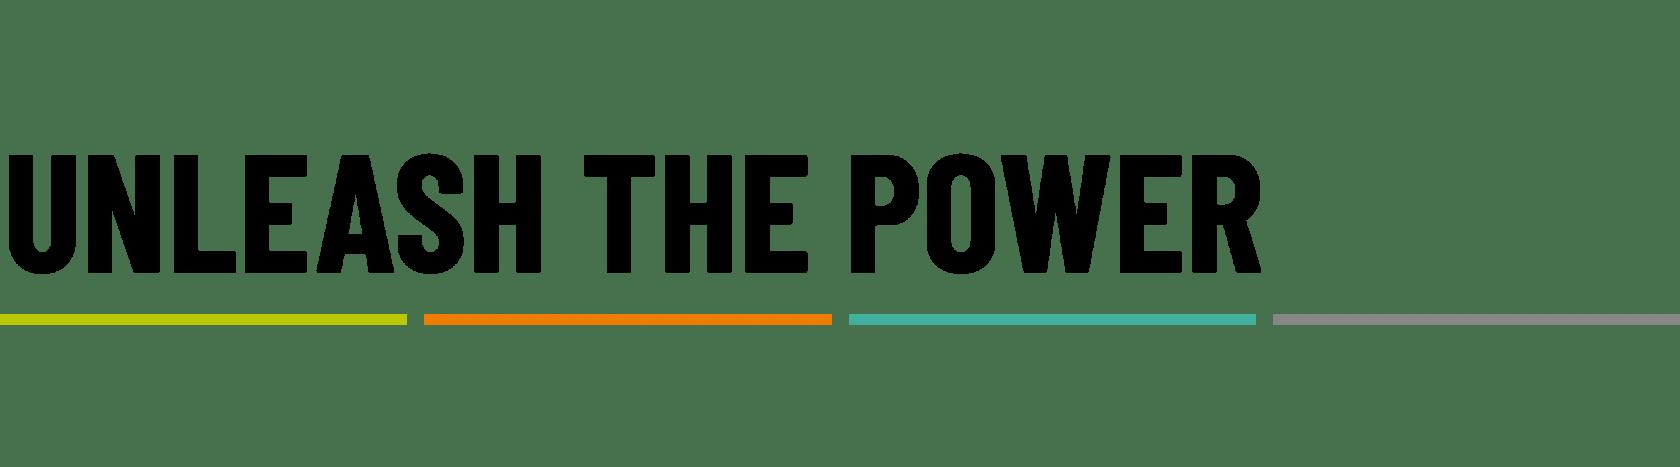 Header_Unleash_Power_Tavola disegno 1